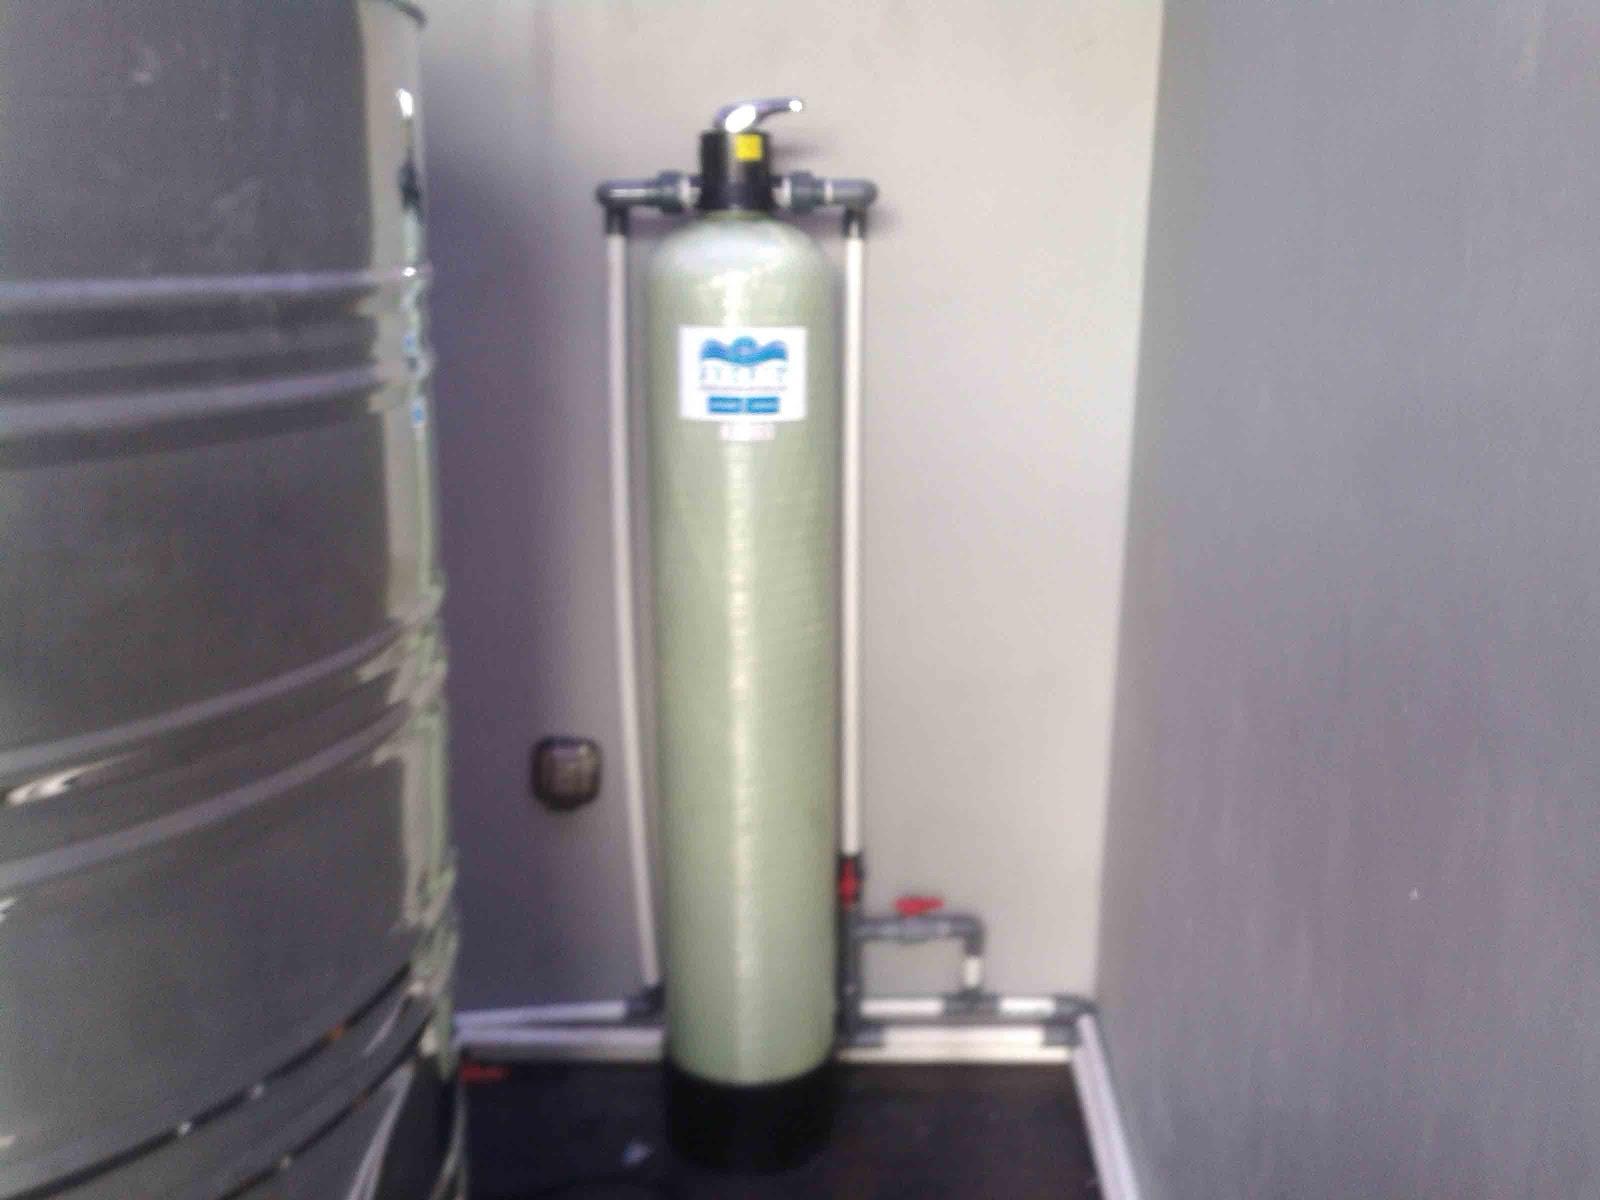 filter air jakarta, murah, jual, garansi, harga, bandung, solo, surabaya, bogor